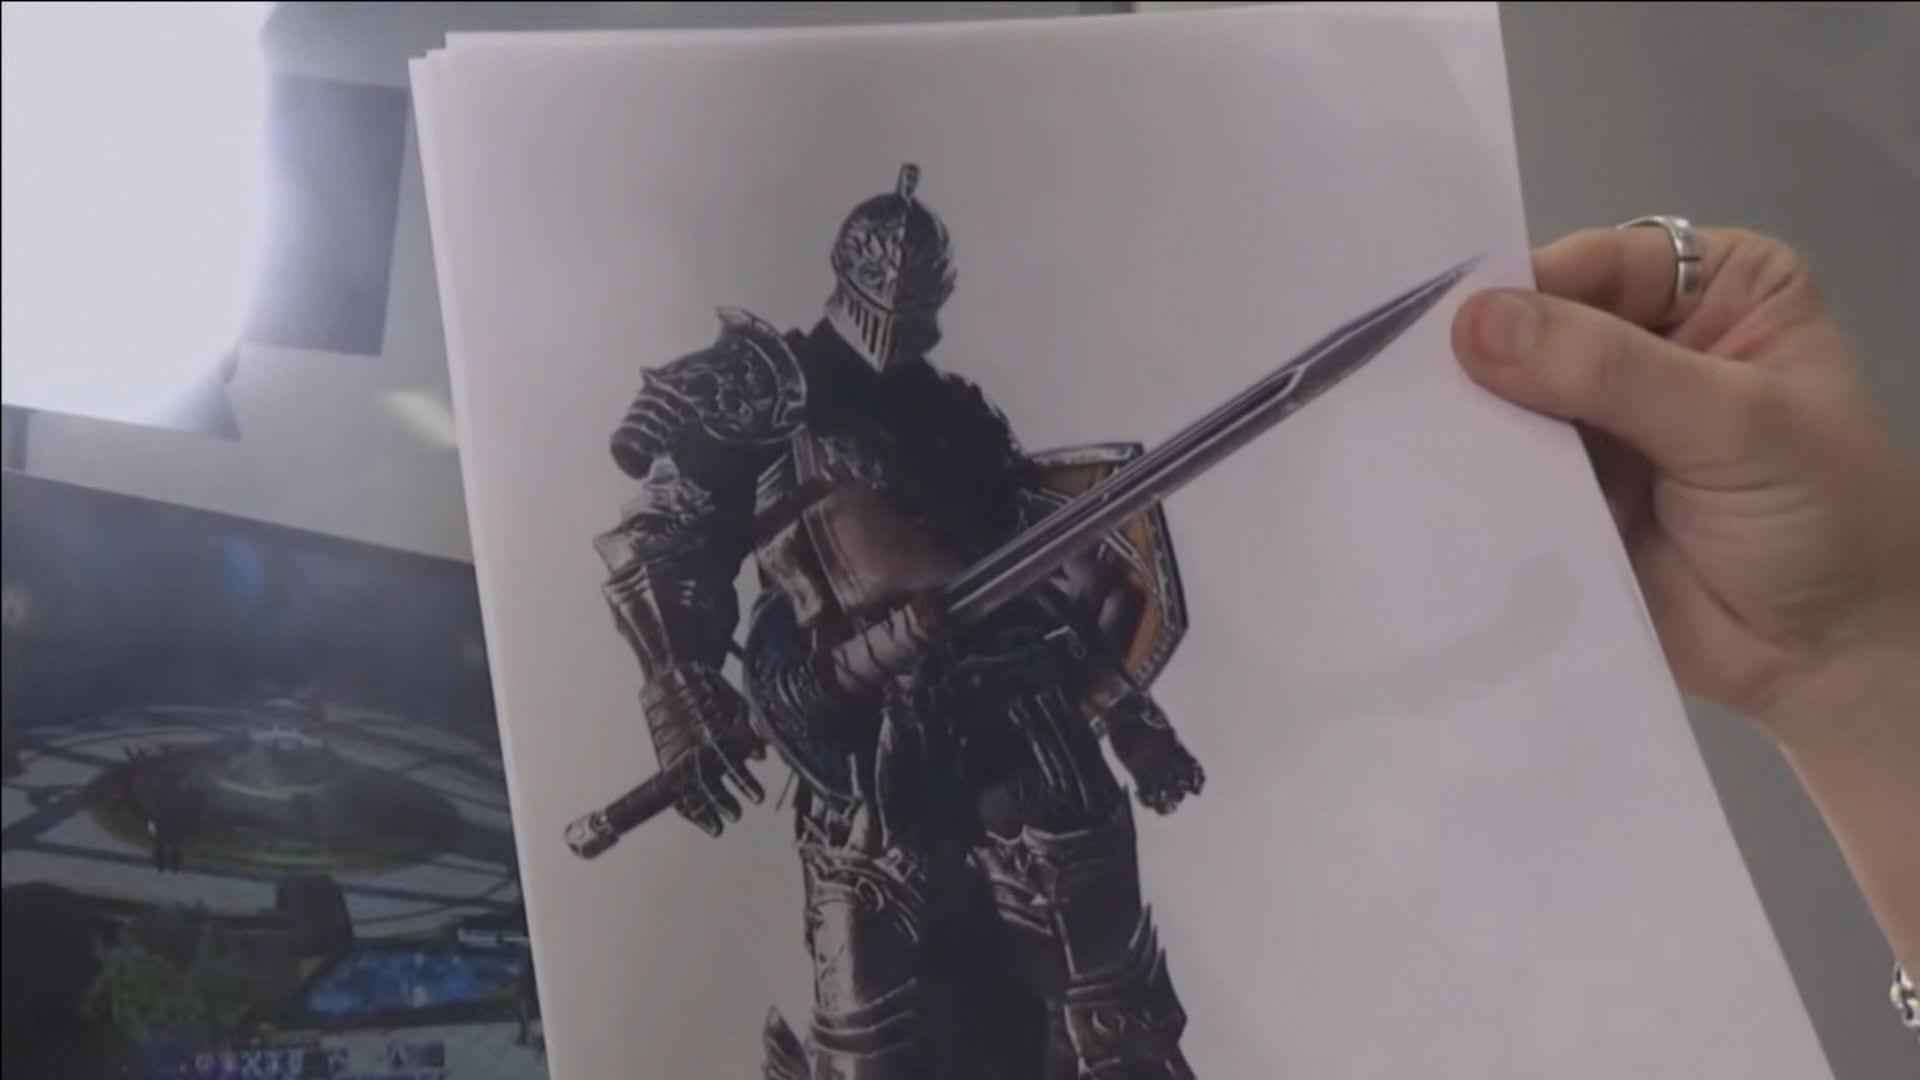 Final-Fantasy-XIV-Screenshot-2020-11-27-13-37-52.jpg